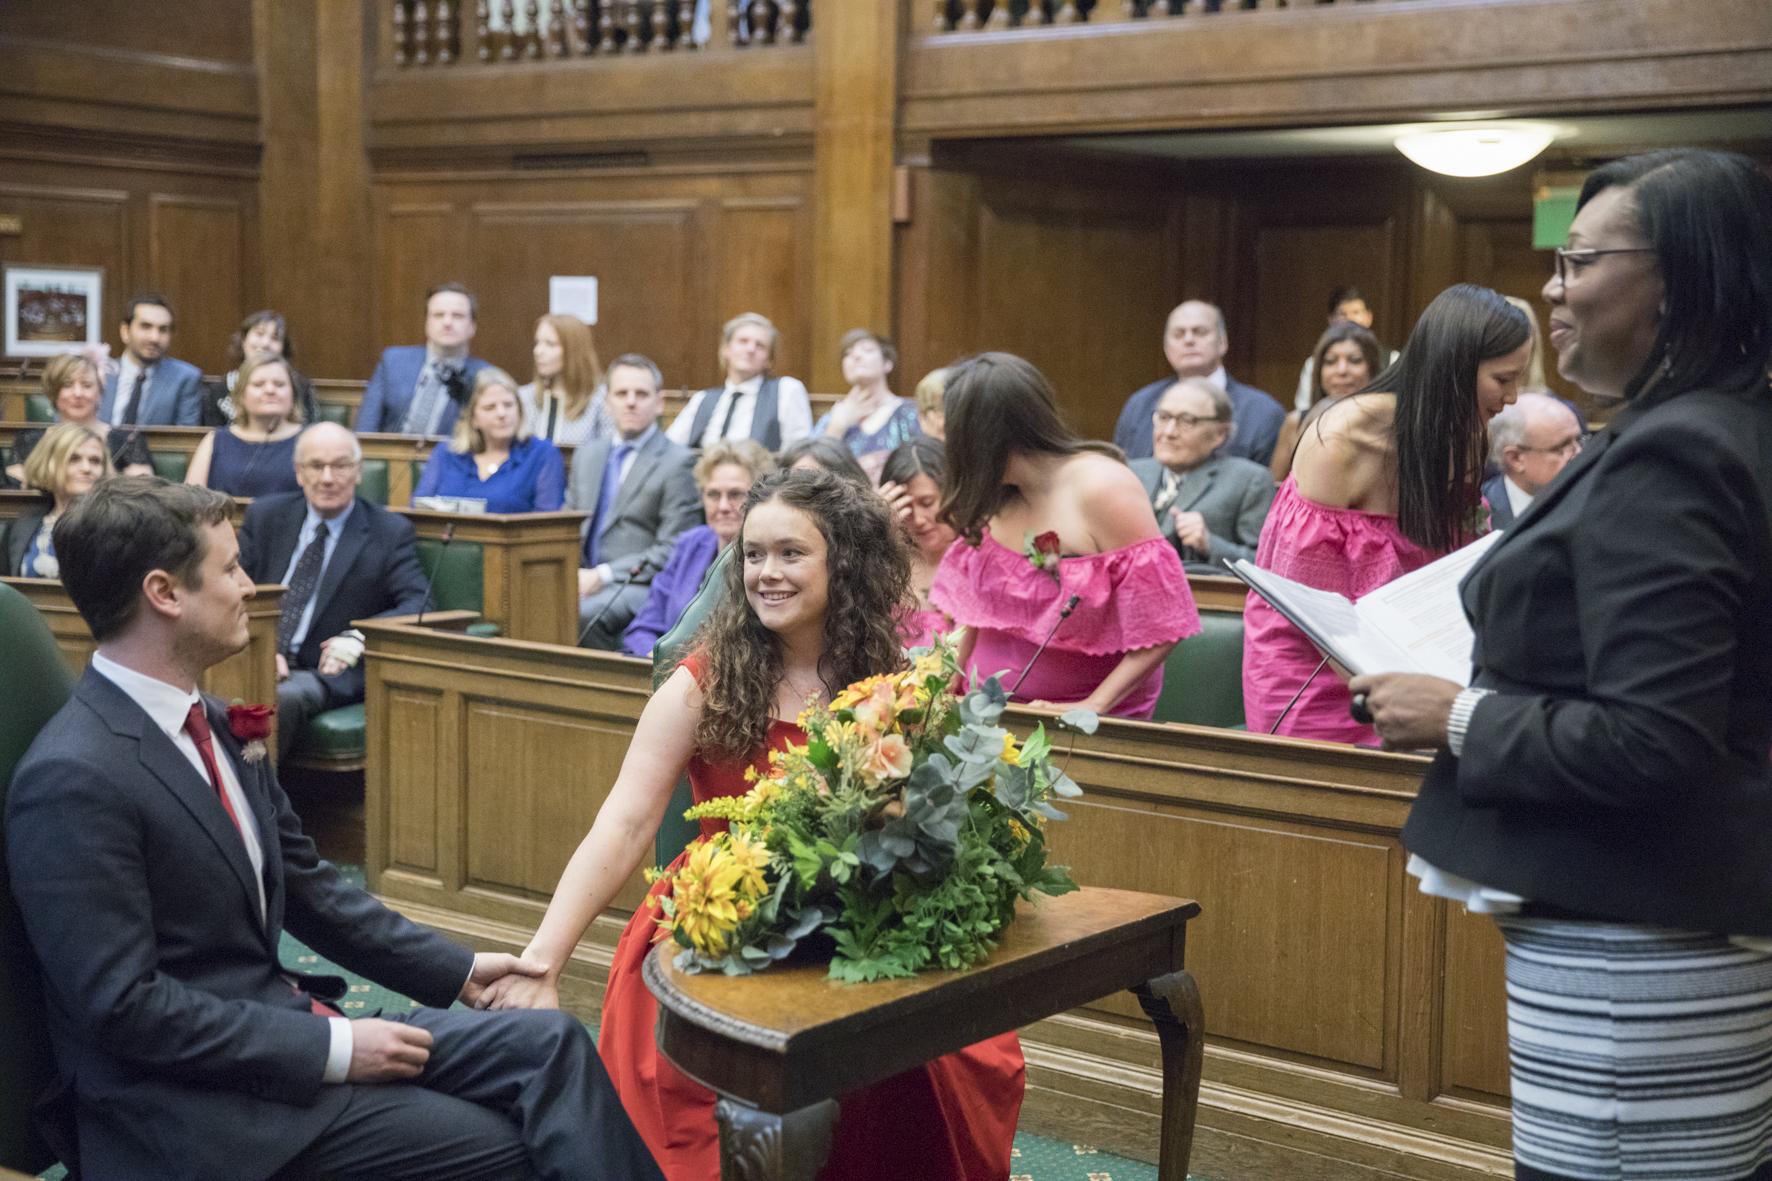 Wedding example_J&J_'16__69A1661_Claudia Leisinger.jpg